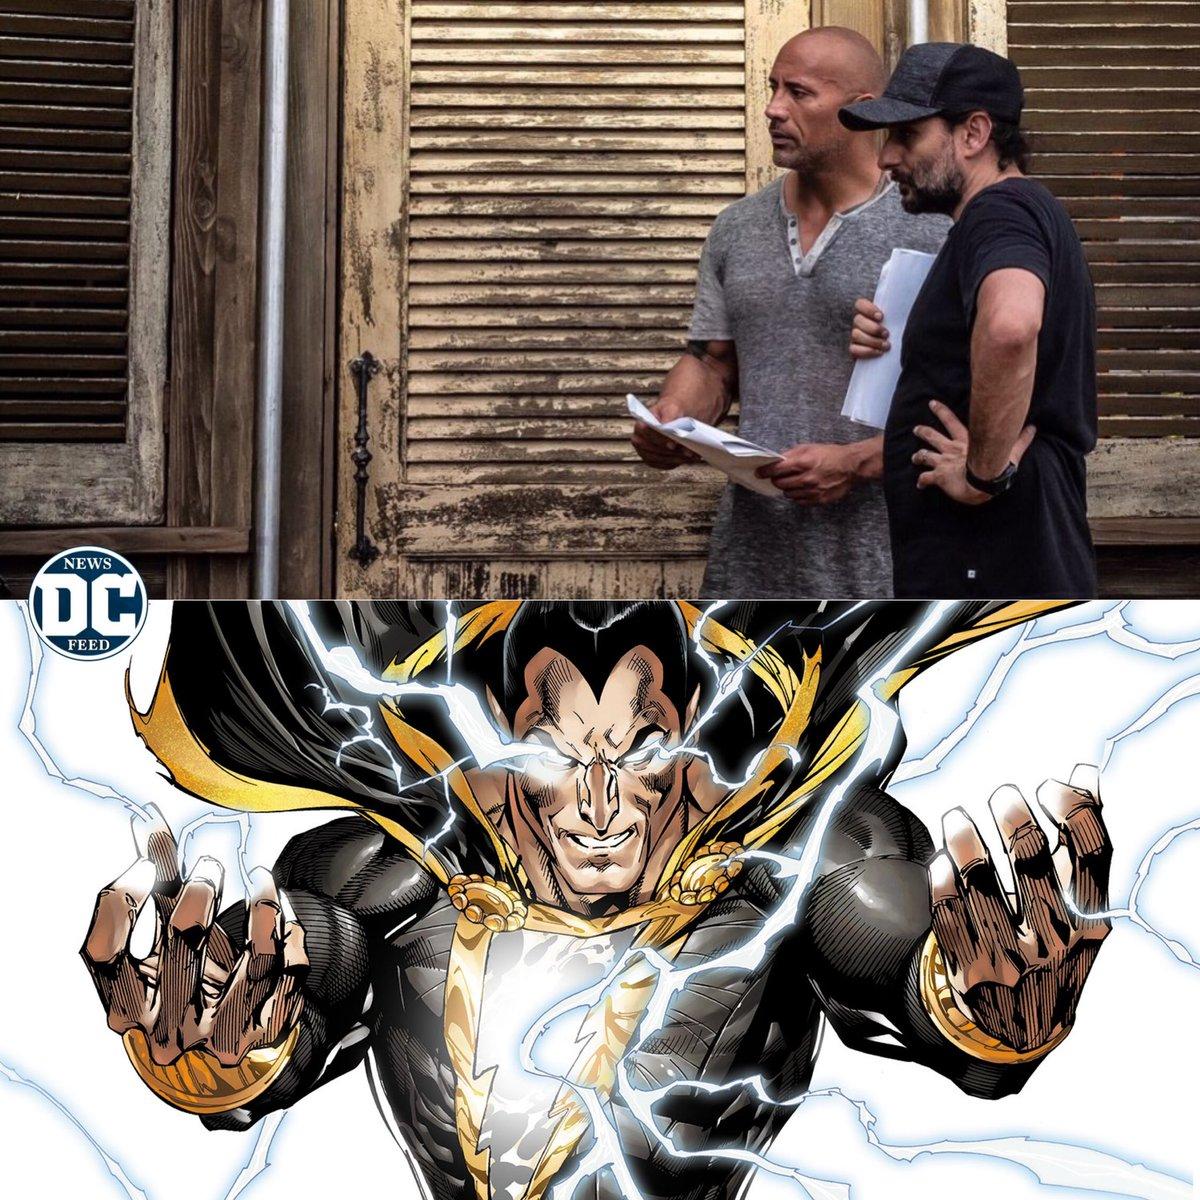 Jaume Collet-Serra In Talks to Direct 'Shazam!' Spinoff 'Black Adam' With Dwayne Johnson Starring